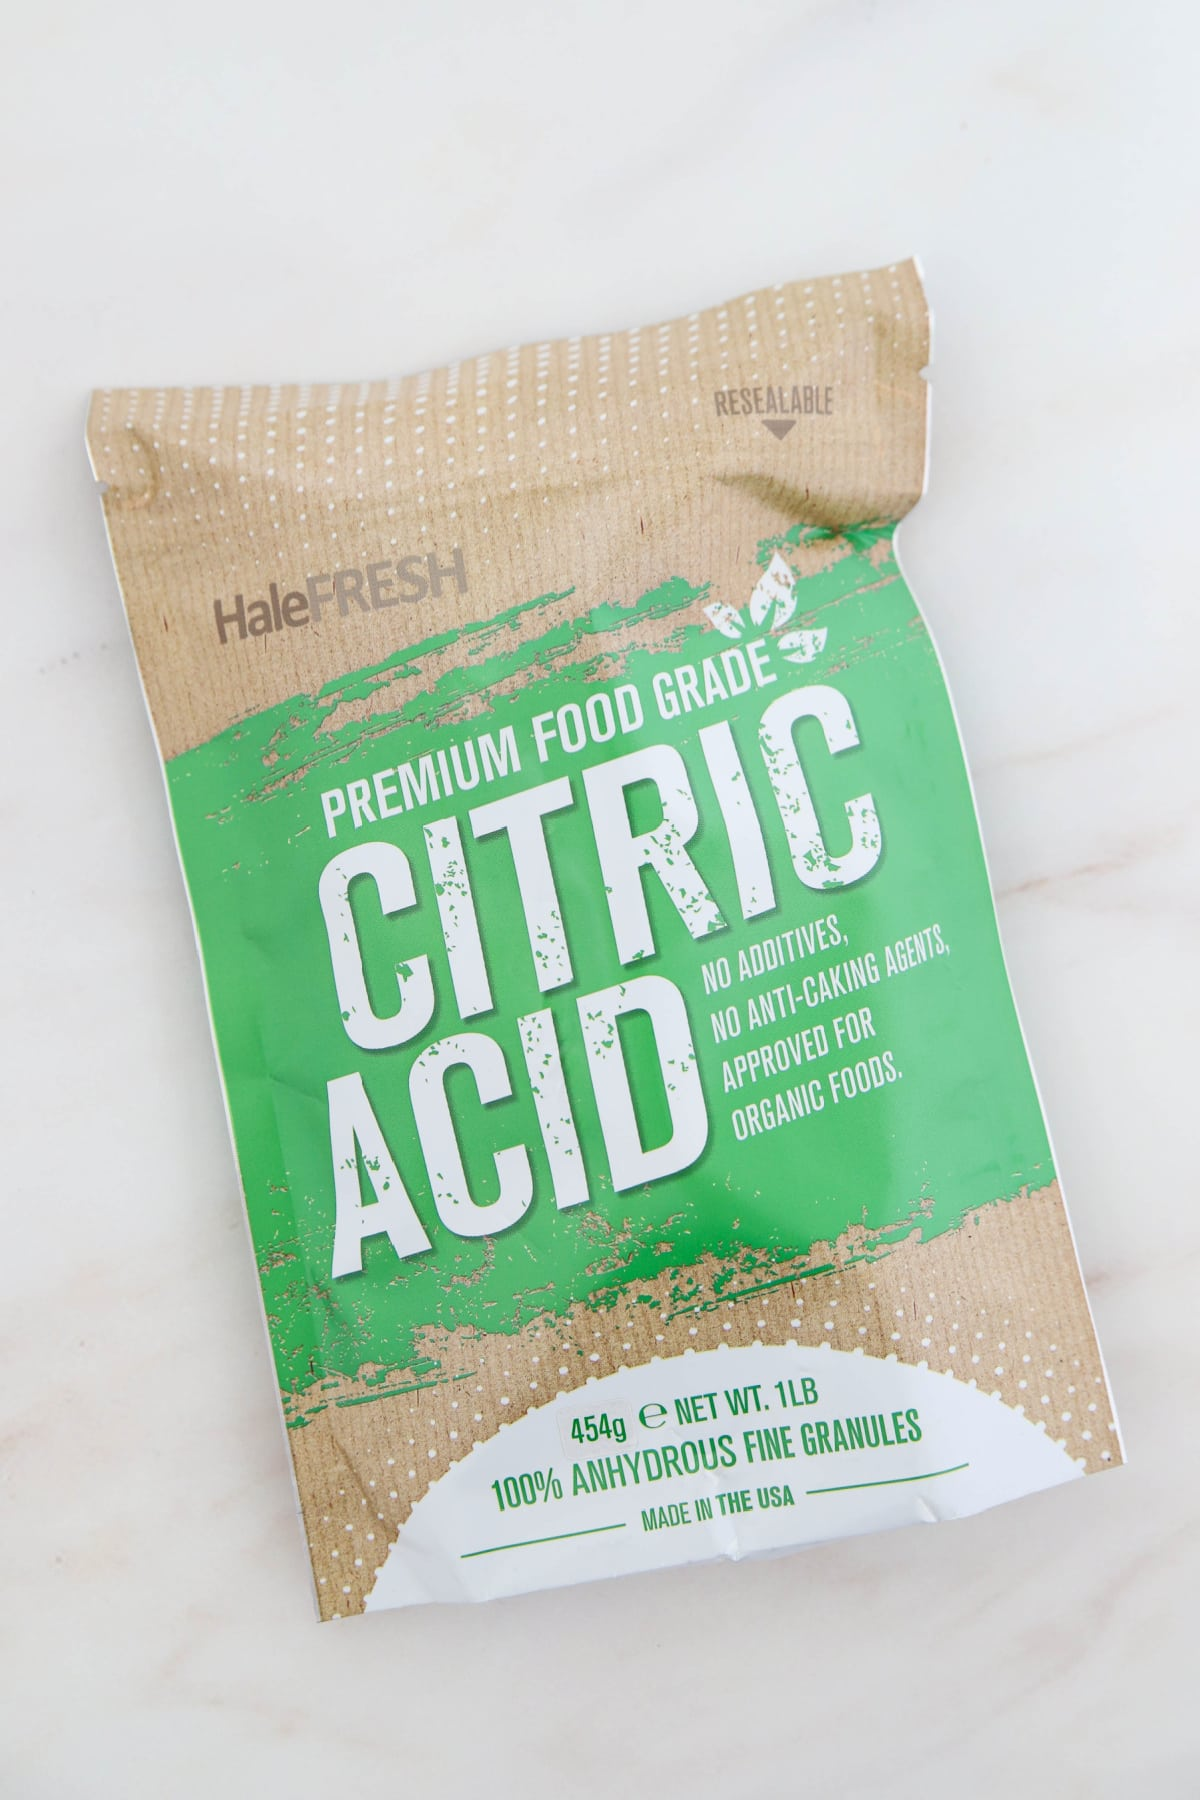 Bag of citric acid